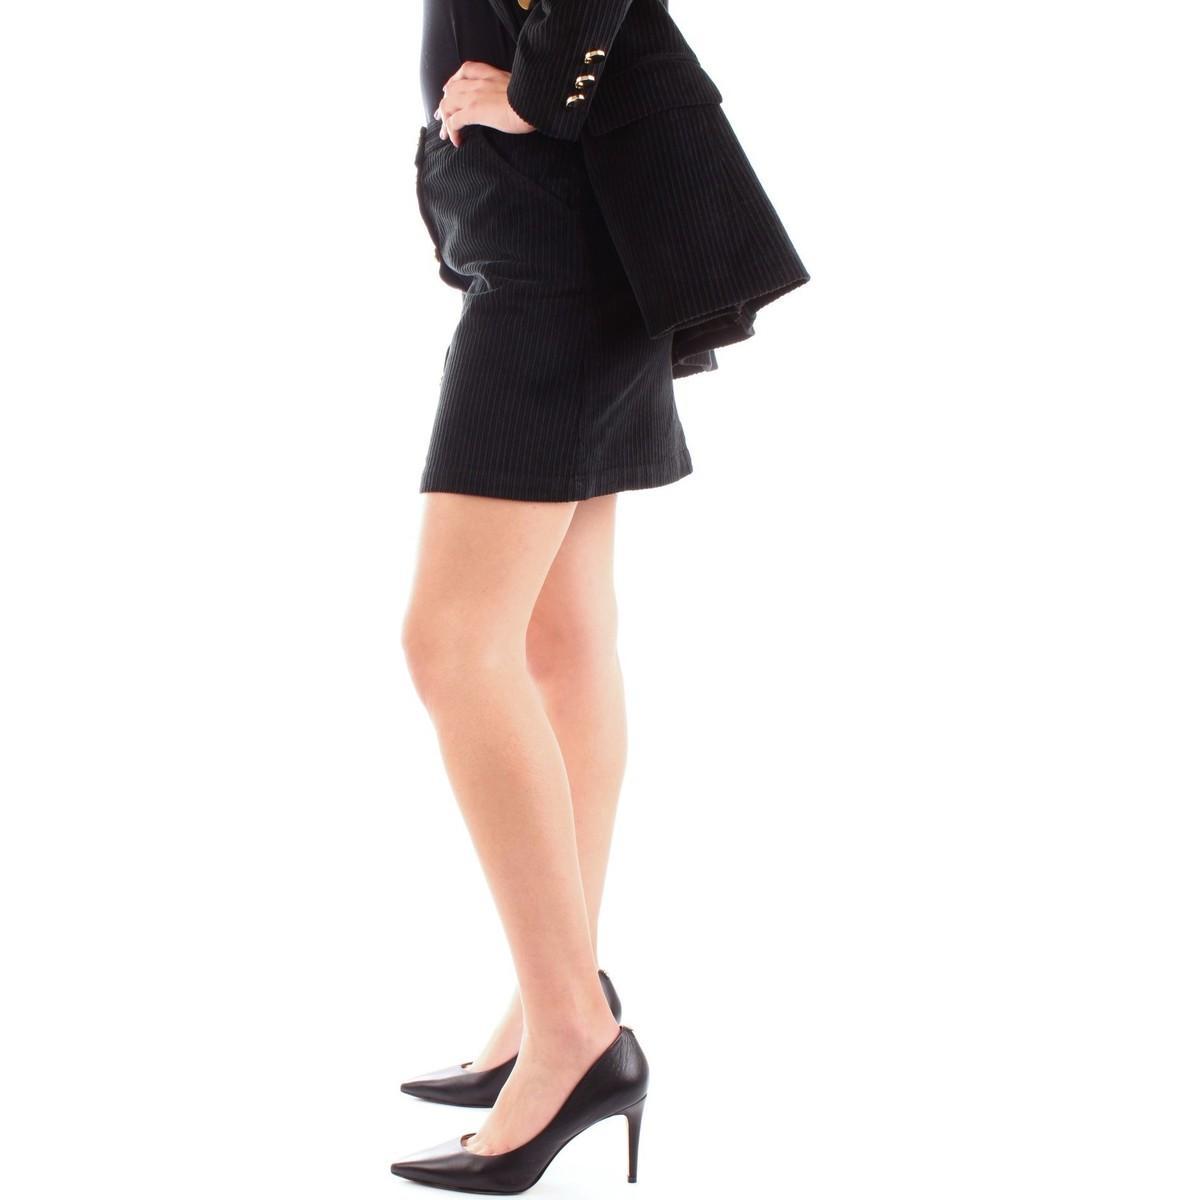 A206/ZC041 minijupes Femme NOIR Jupes Annarita N. en coloris Noir